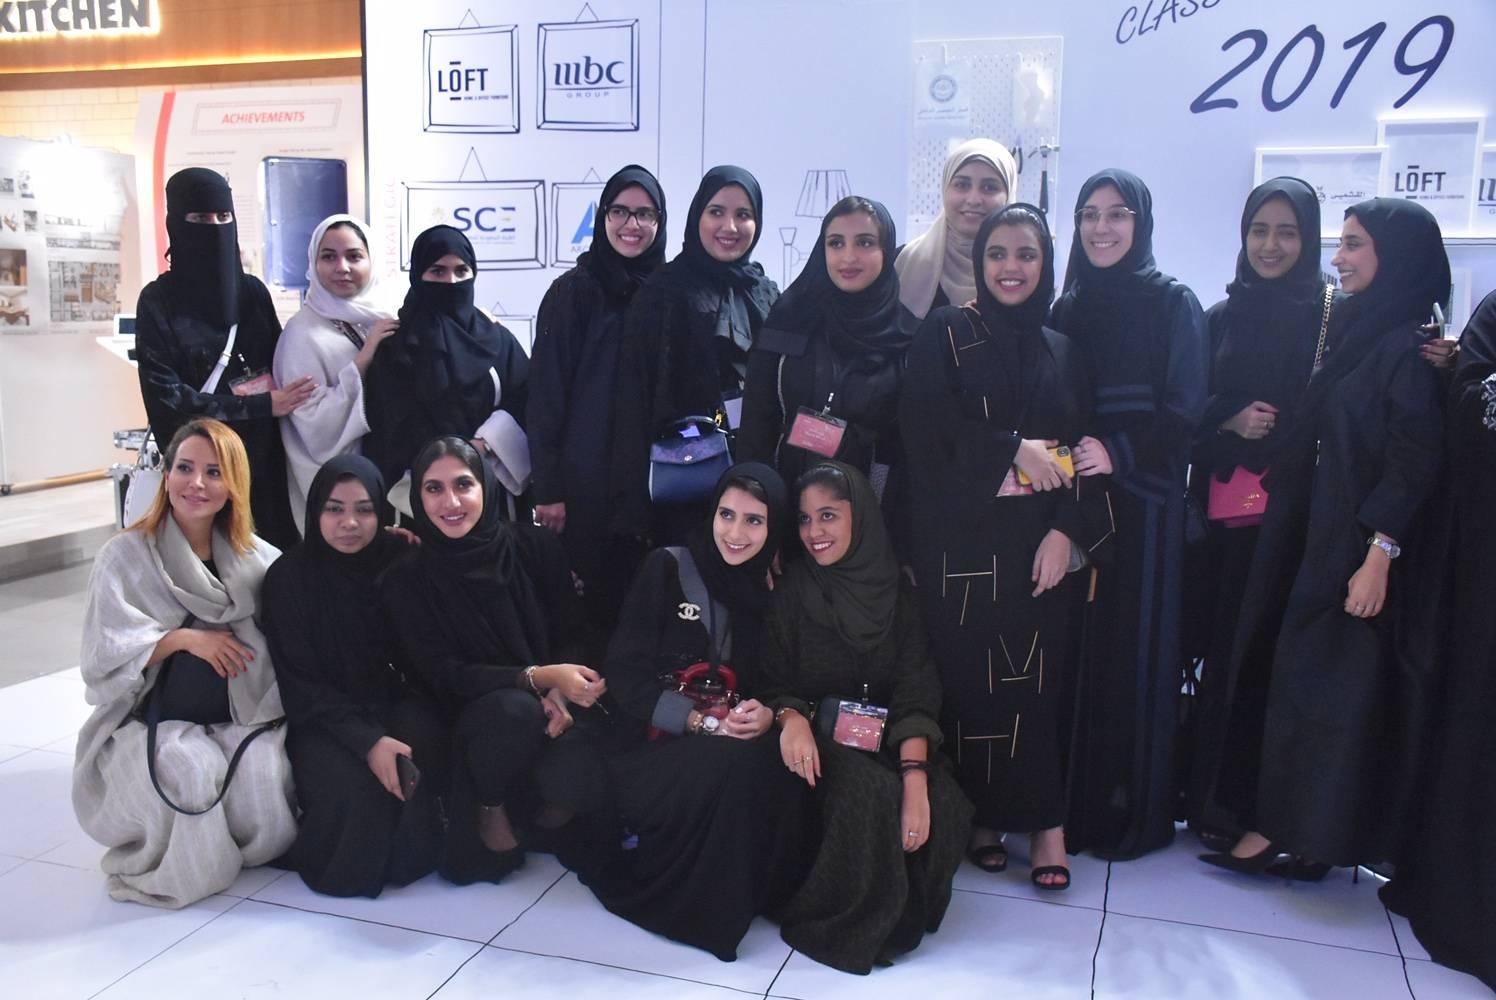 Dar Al Hekma Seniors Captivate Visitors To Interior Design Expo With Creative Skills Saudi Gazette